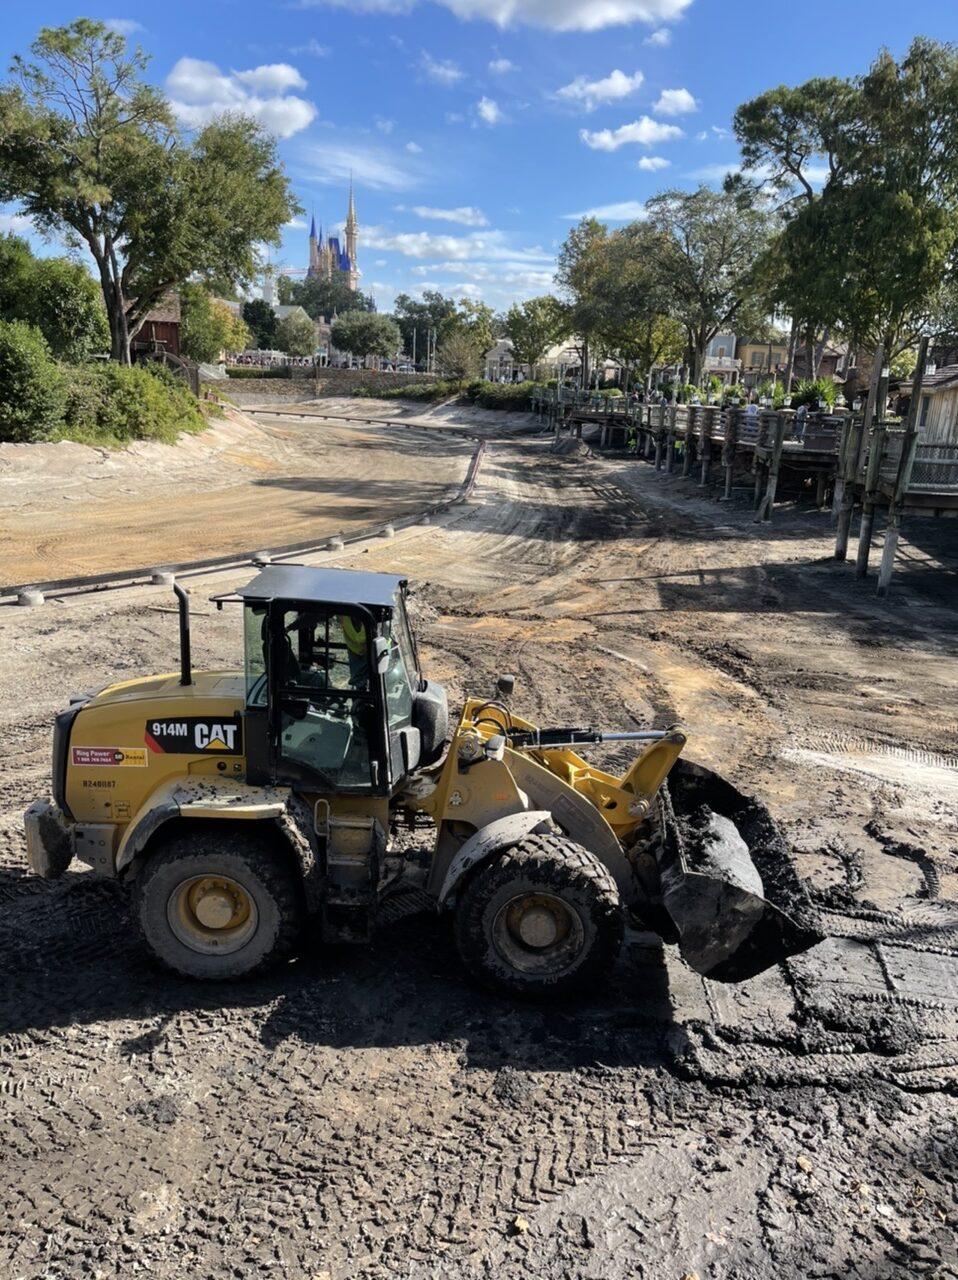 Walt Disney World's Frontierland refurbishment, December 3, 2020.